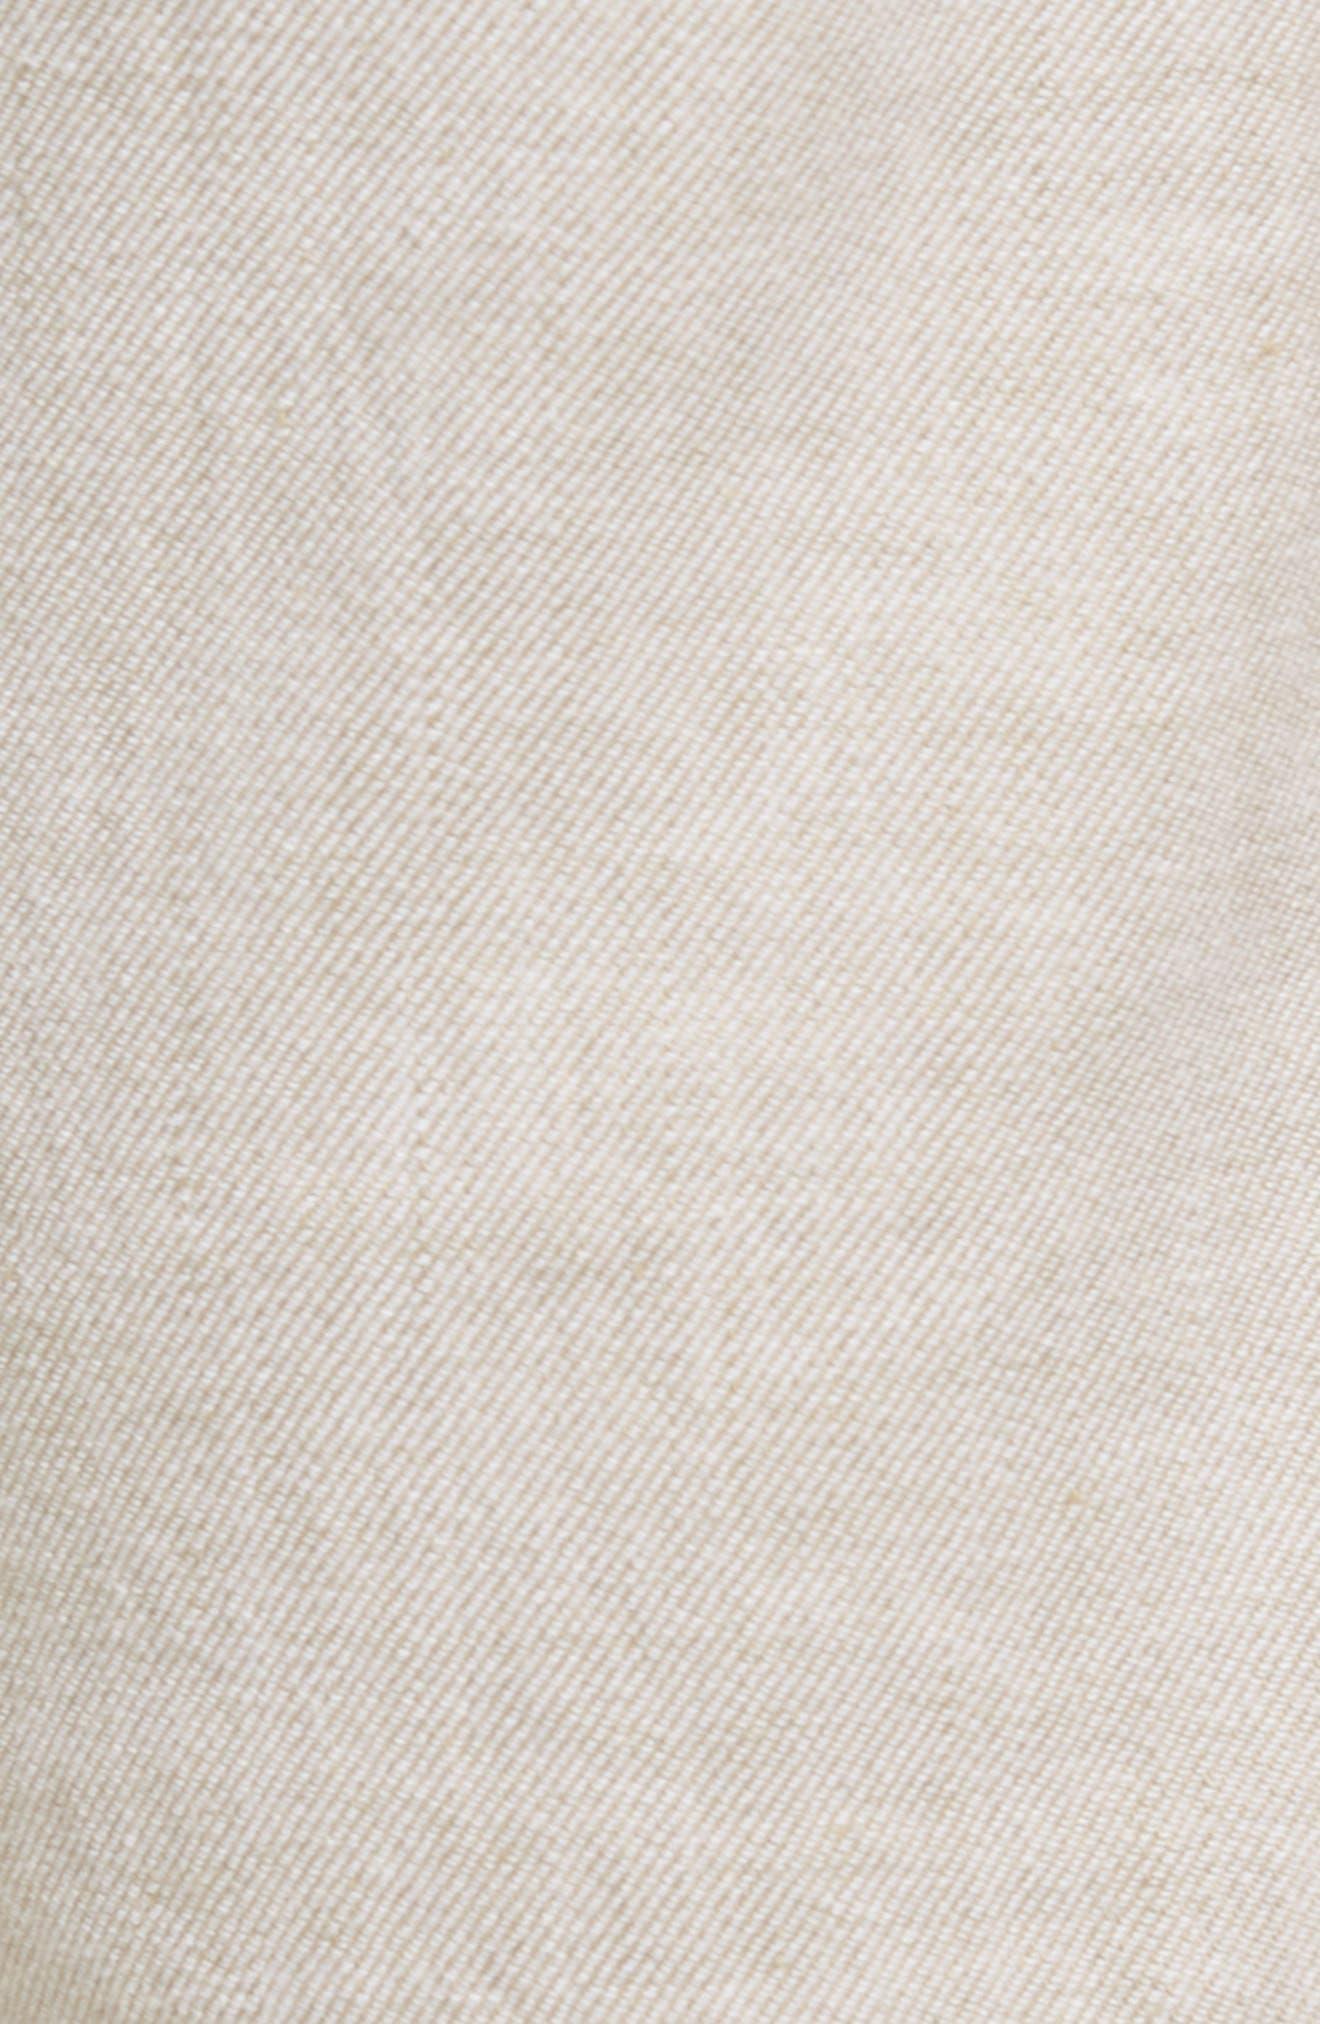 Beach Linen Blend Pants,                             Alternate thumbnail 5, color,                             Stone Khaki